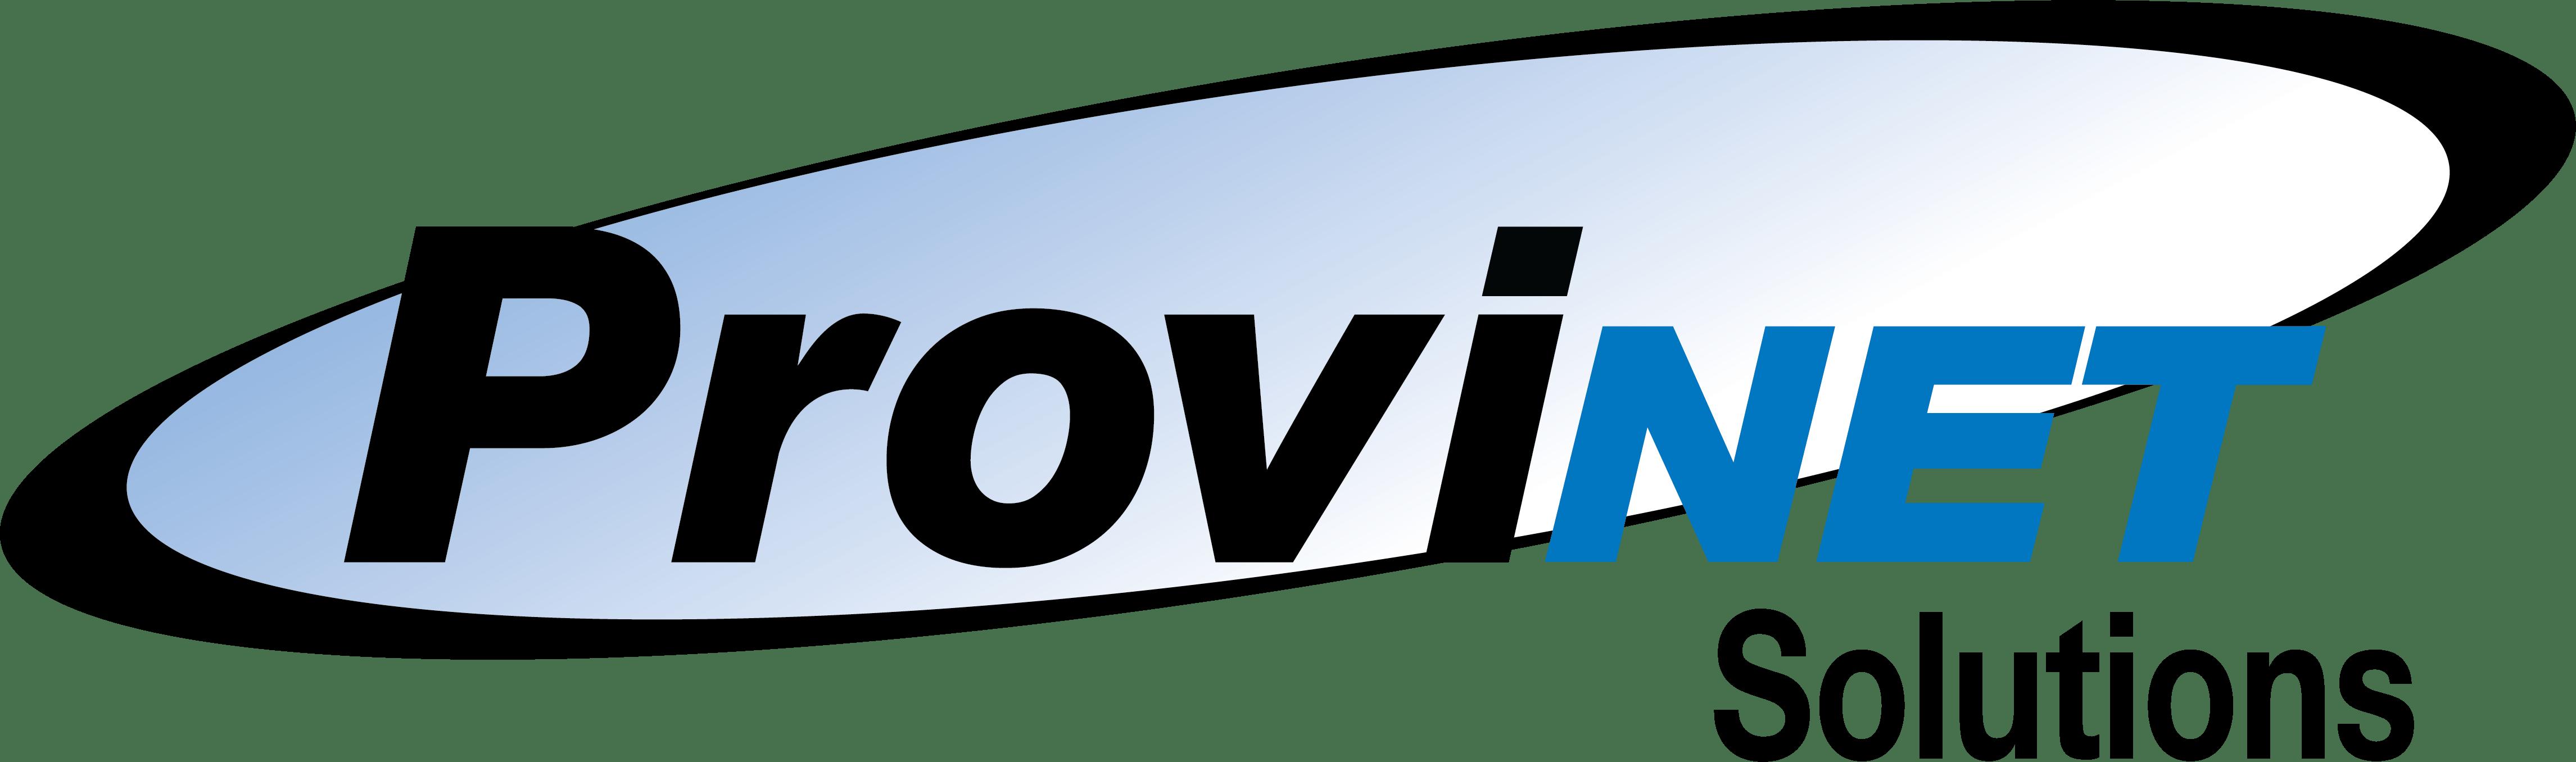 ProviNET Solutions company logo